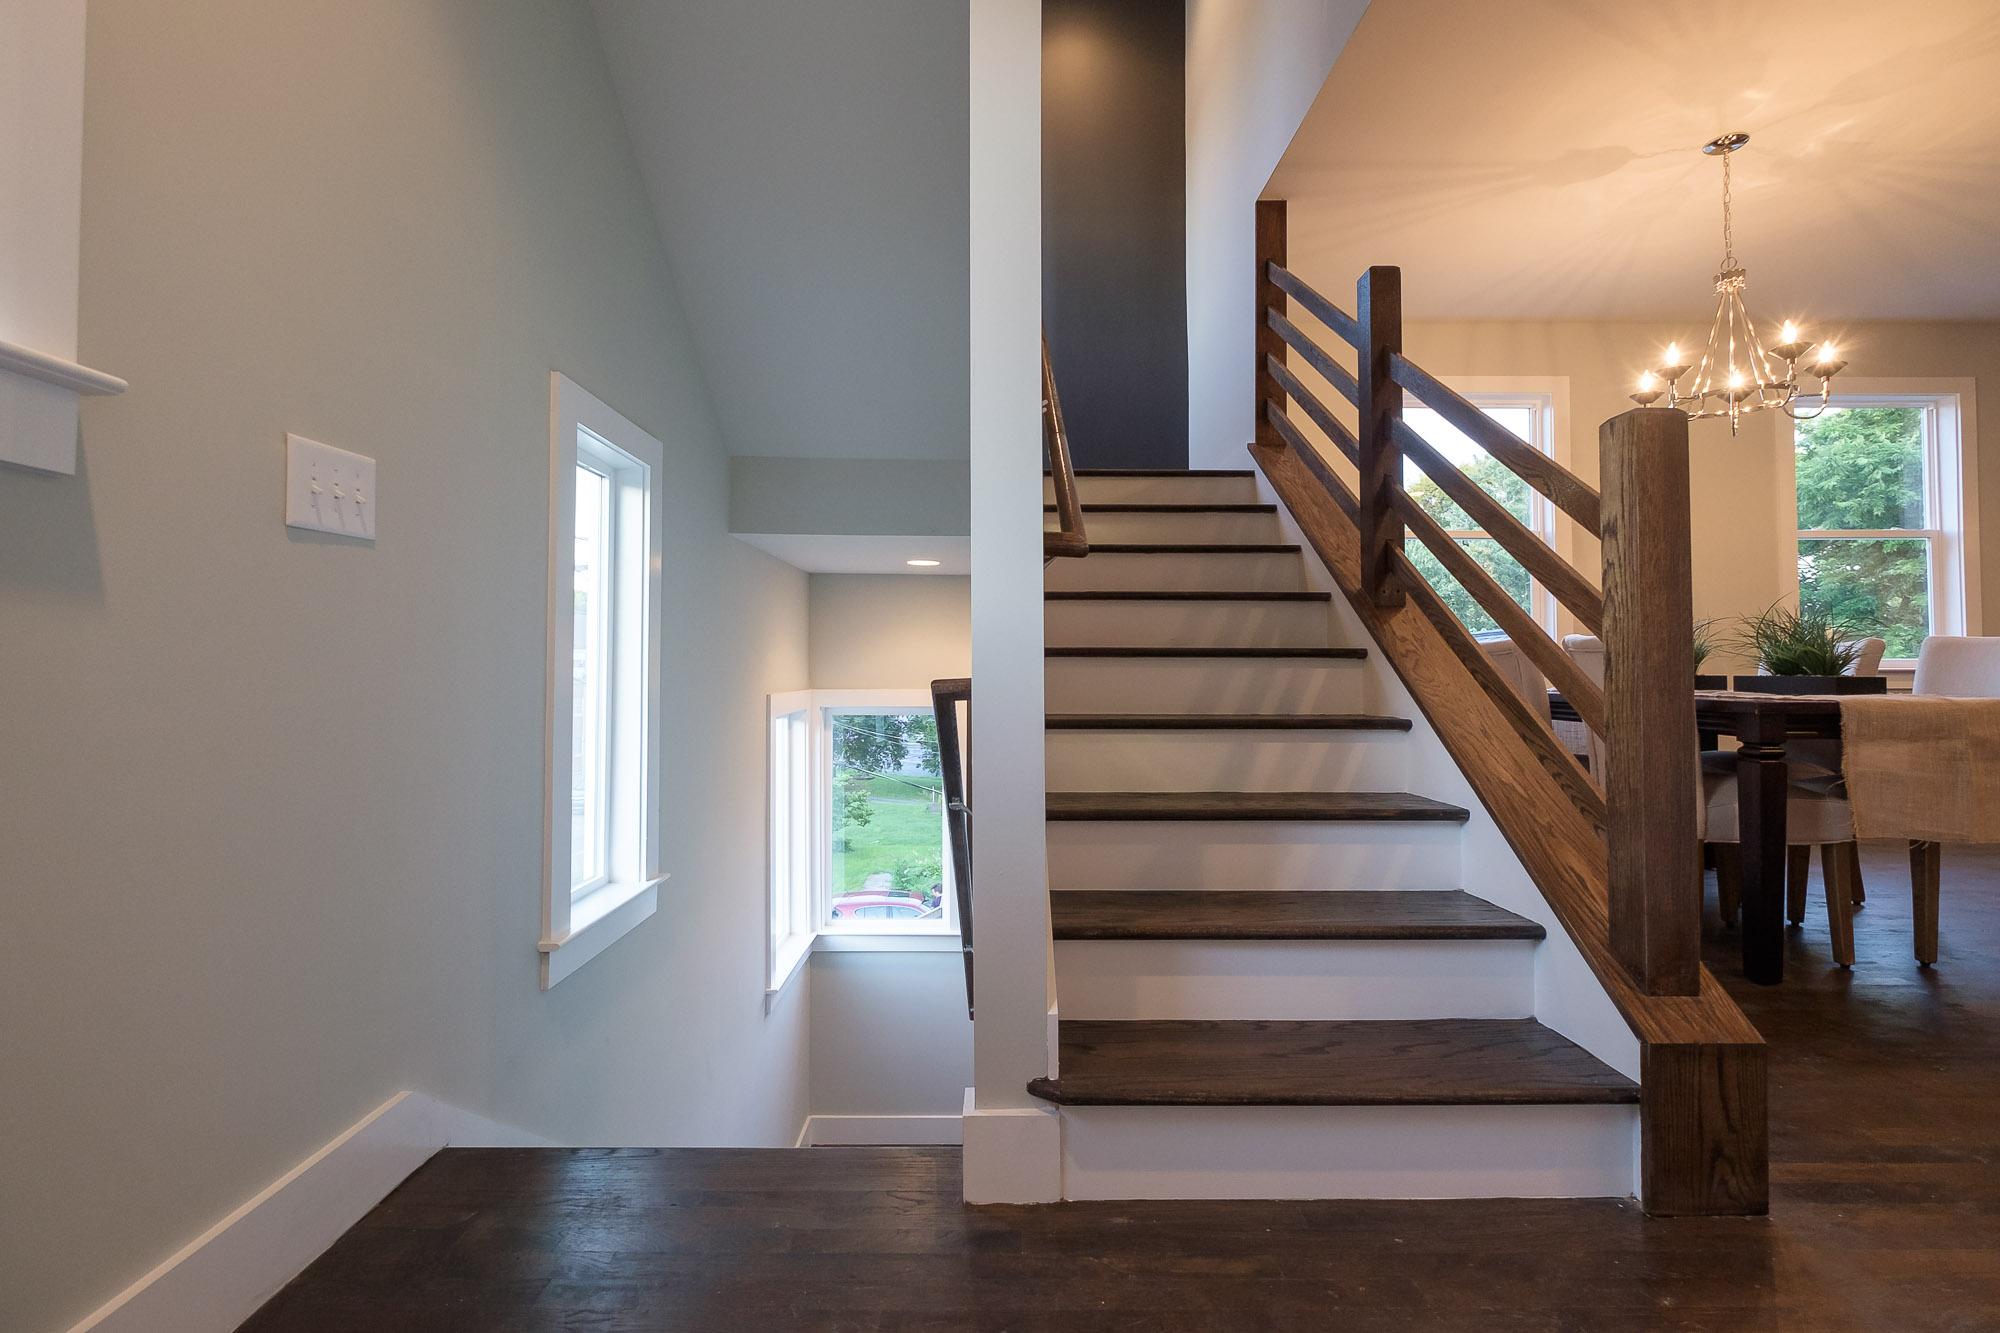 House-Plans-Online-Duplex-Nashville-Peggy-Newman-Stairs-Windows-Porter.jpg